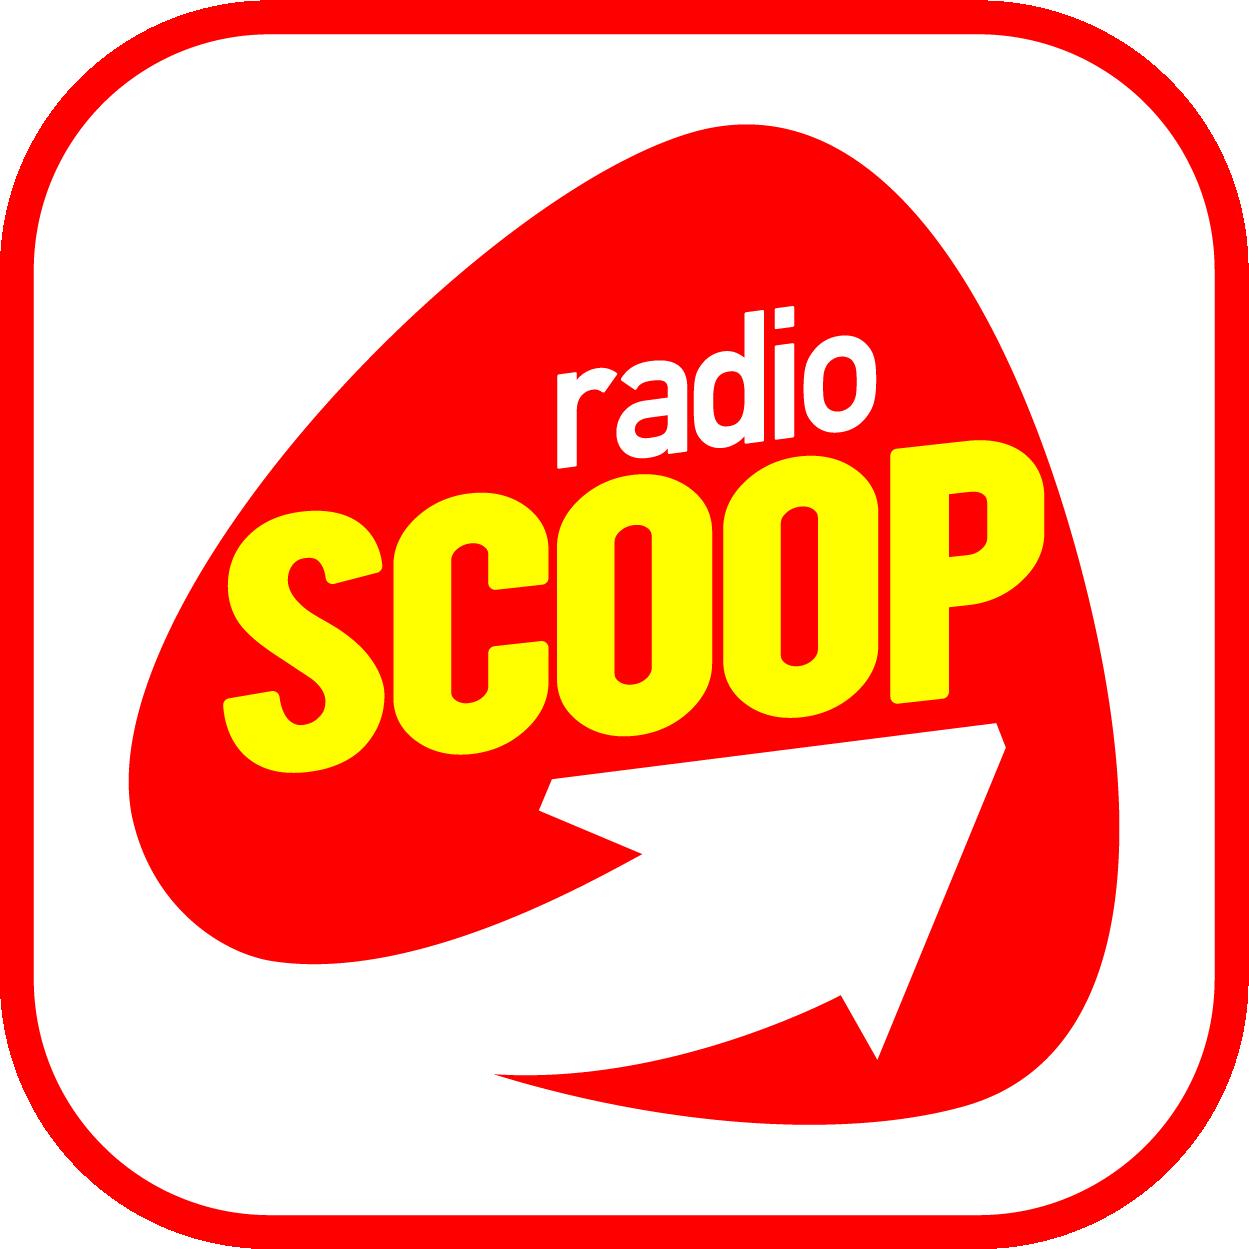 RADIO-SCOOP-RVB-2018